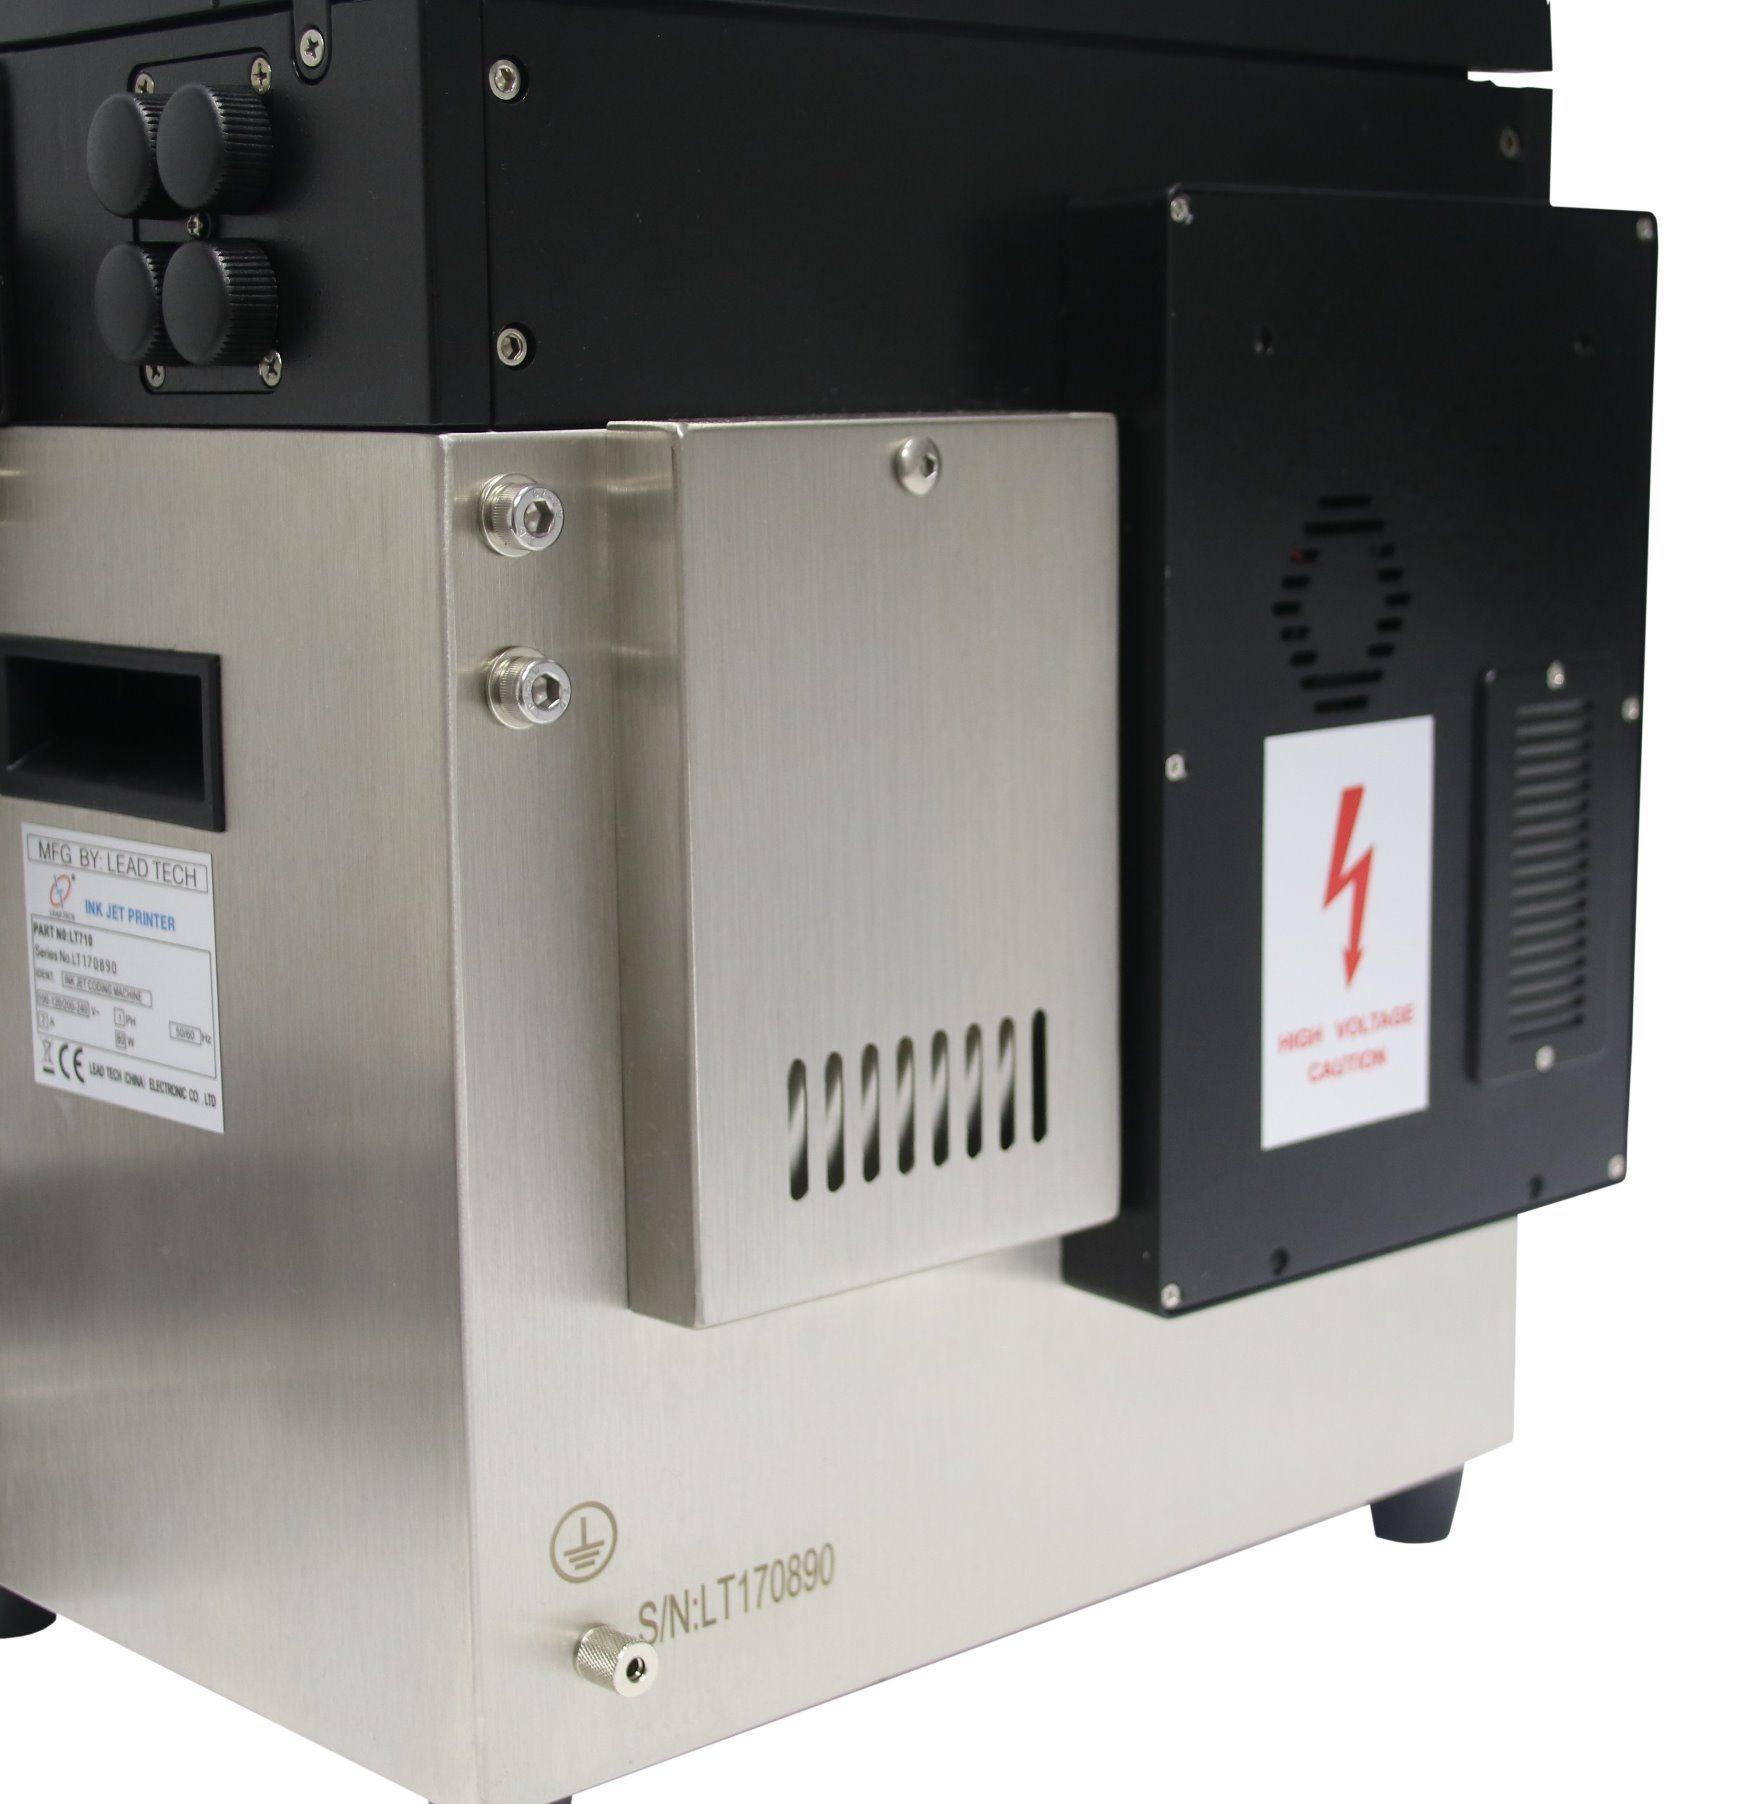 Lead Tech Lt760 1d Barcode Coding Inkjet Printer